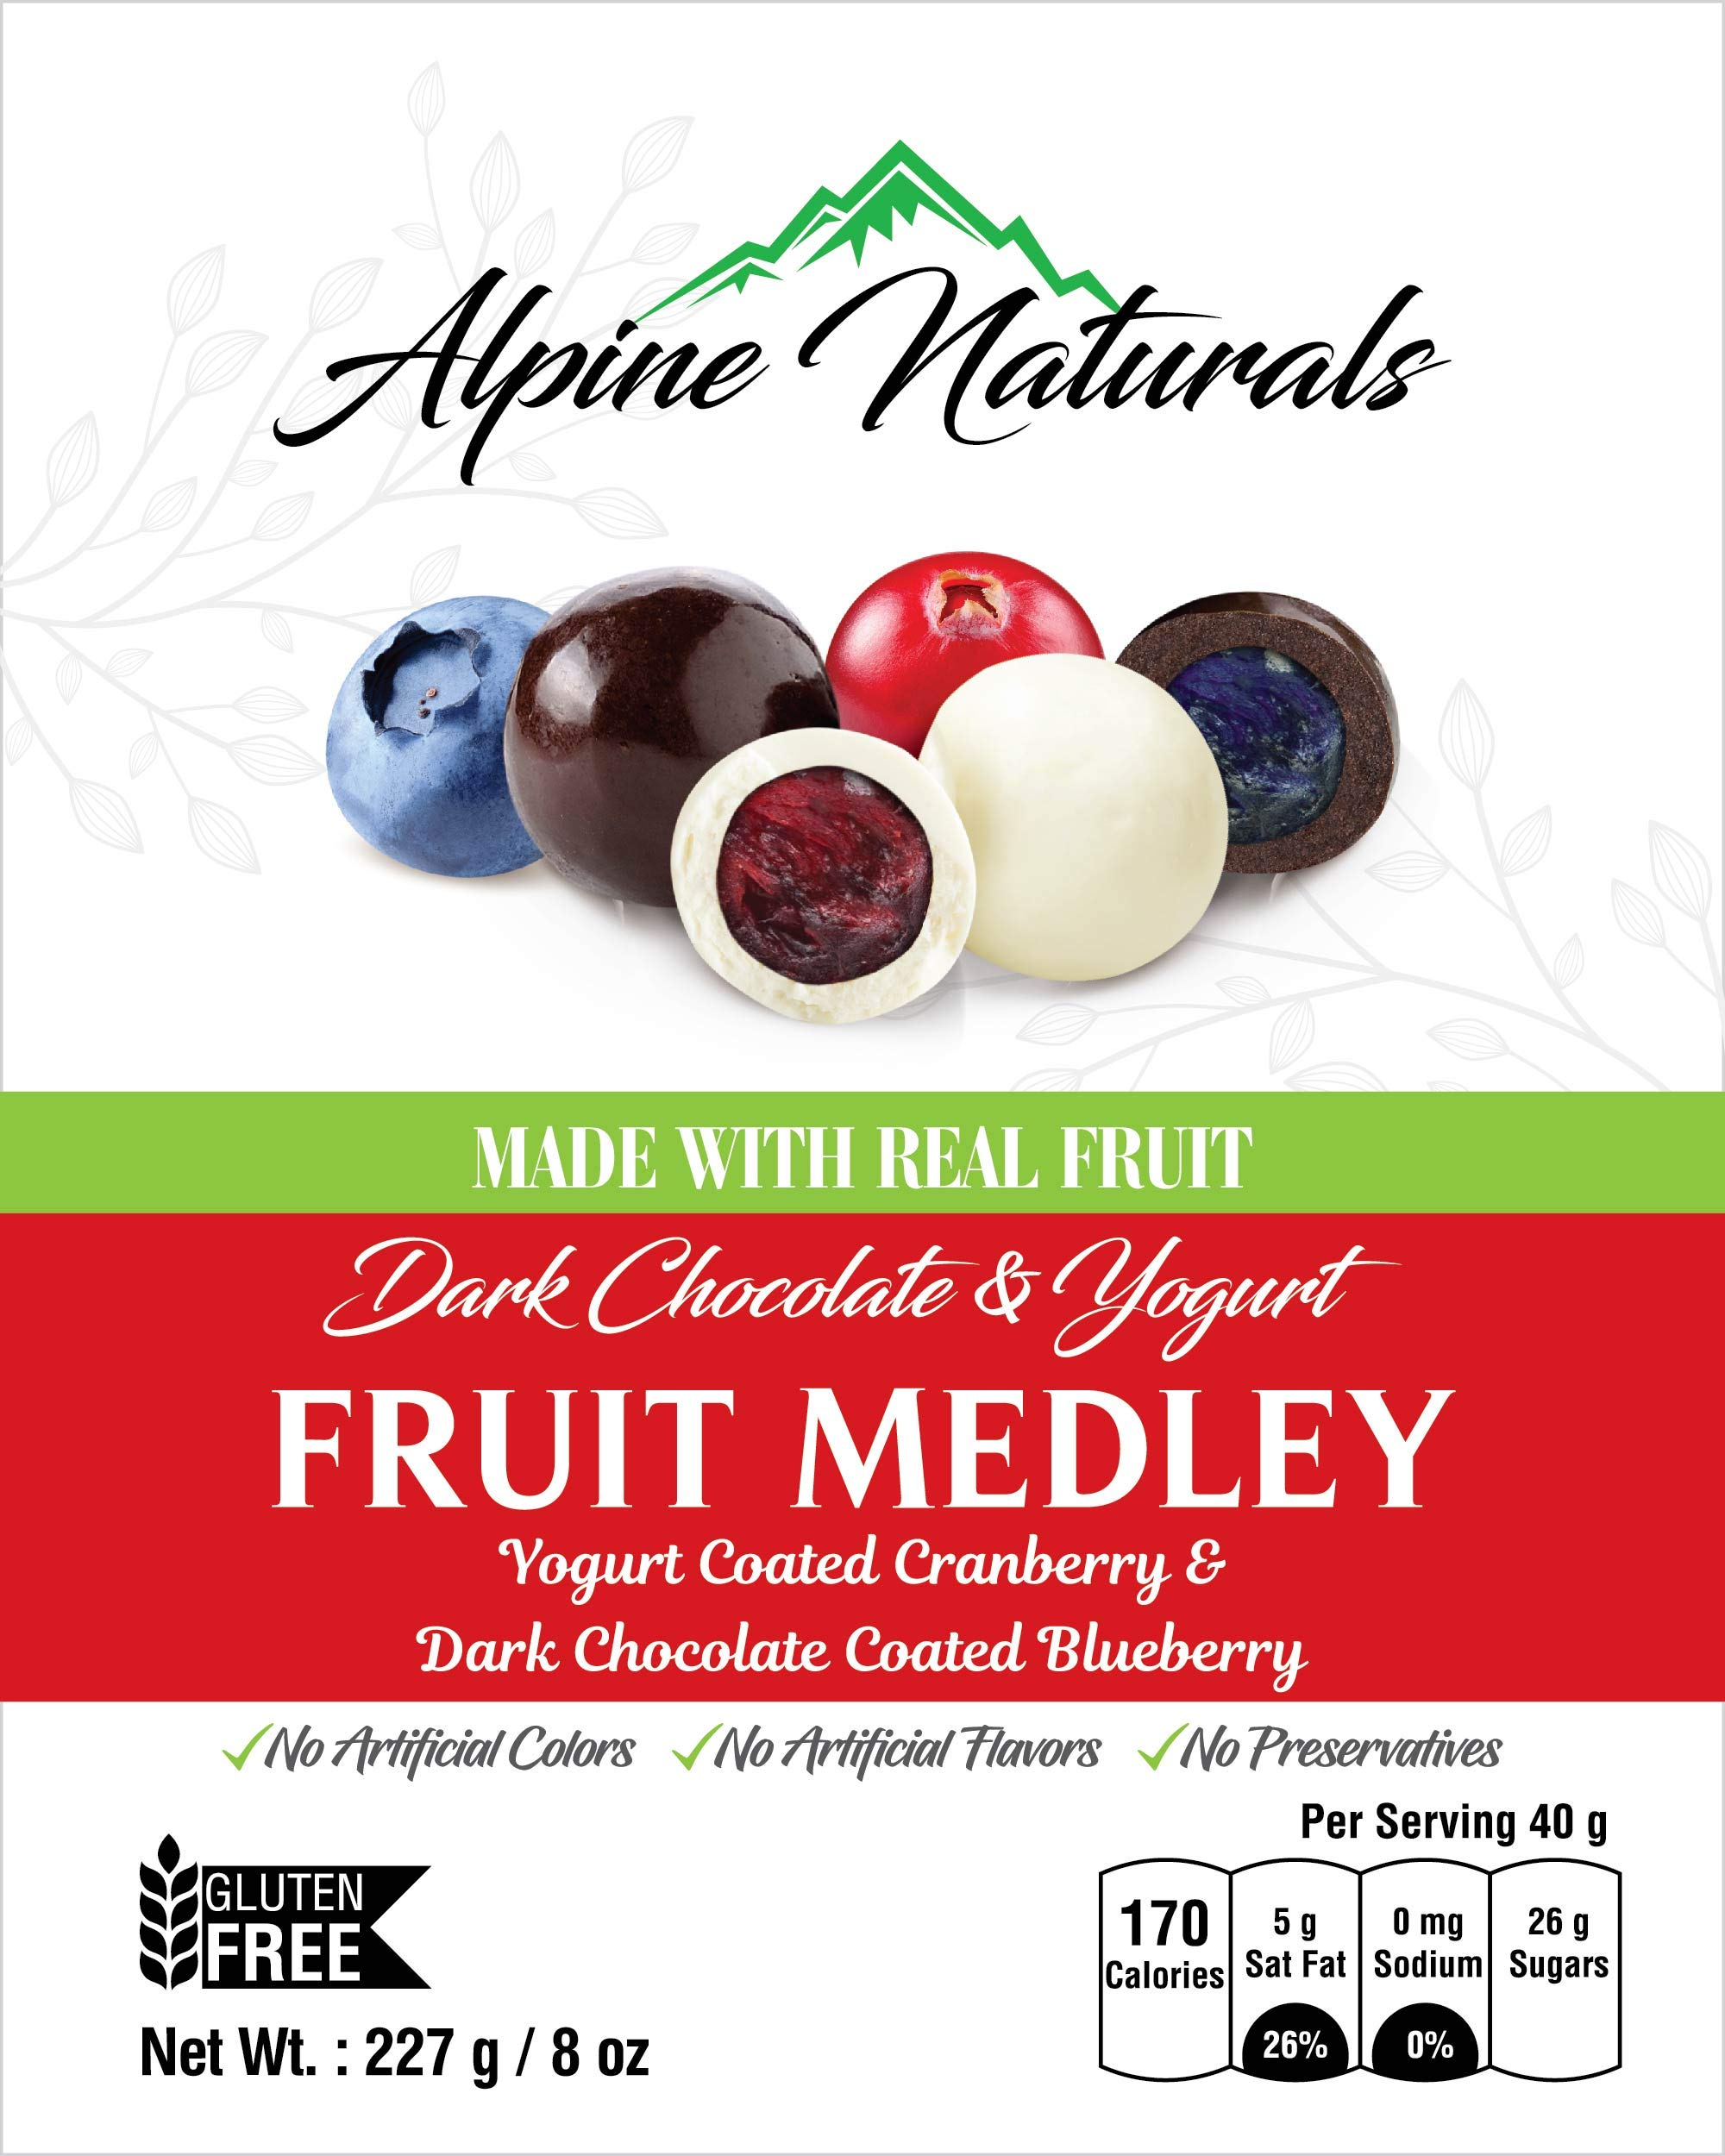 Alpine Naturals Fruit Medley Dark Chocolate Blueberries & Yogurt Cranberries, 8 Ounce